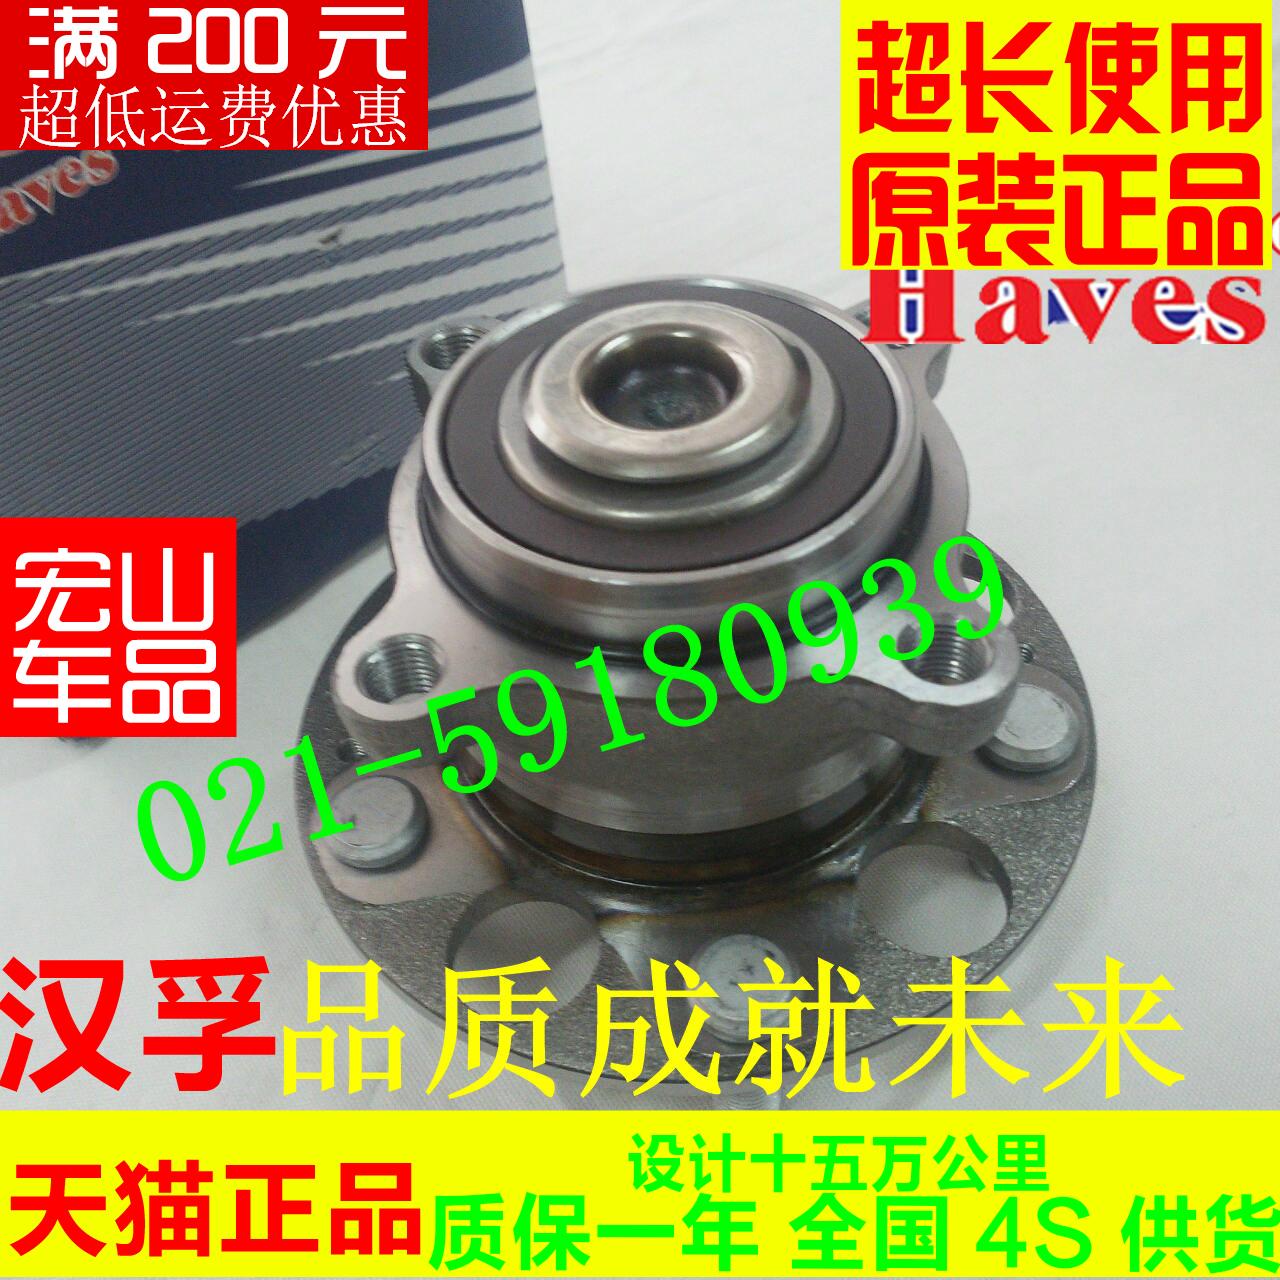 China Front Civic Shopping Guide At Alibabacom 1992 Honda Spindle Get Quotations Haves Accord Odyssey Crv Rear Wheel Bearing